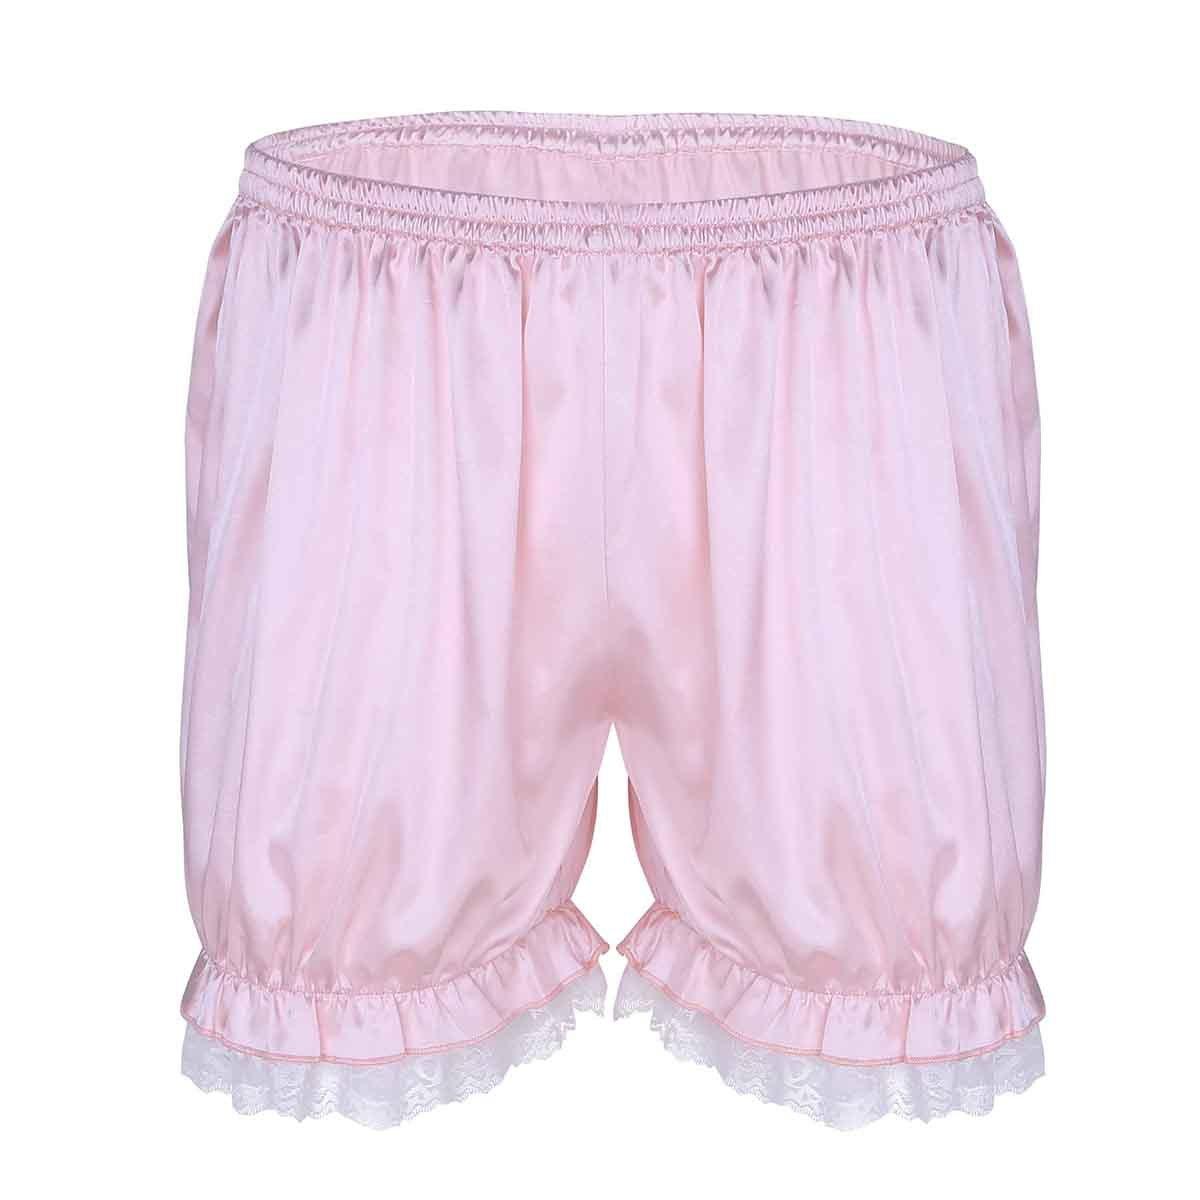 1fd36f1828 Set Include: 1Pc Underwear Men's bikini briefs thong underwear. High cut  and open butt style. Low rise, unique ruffled frilly design